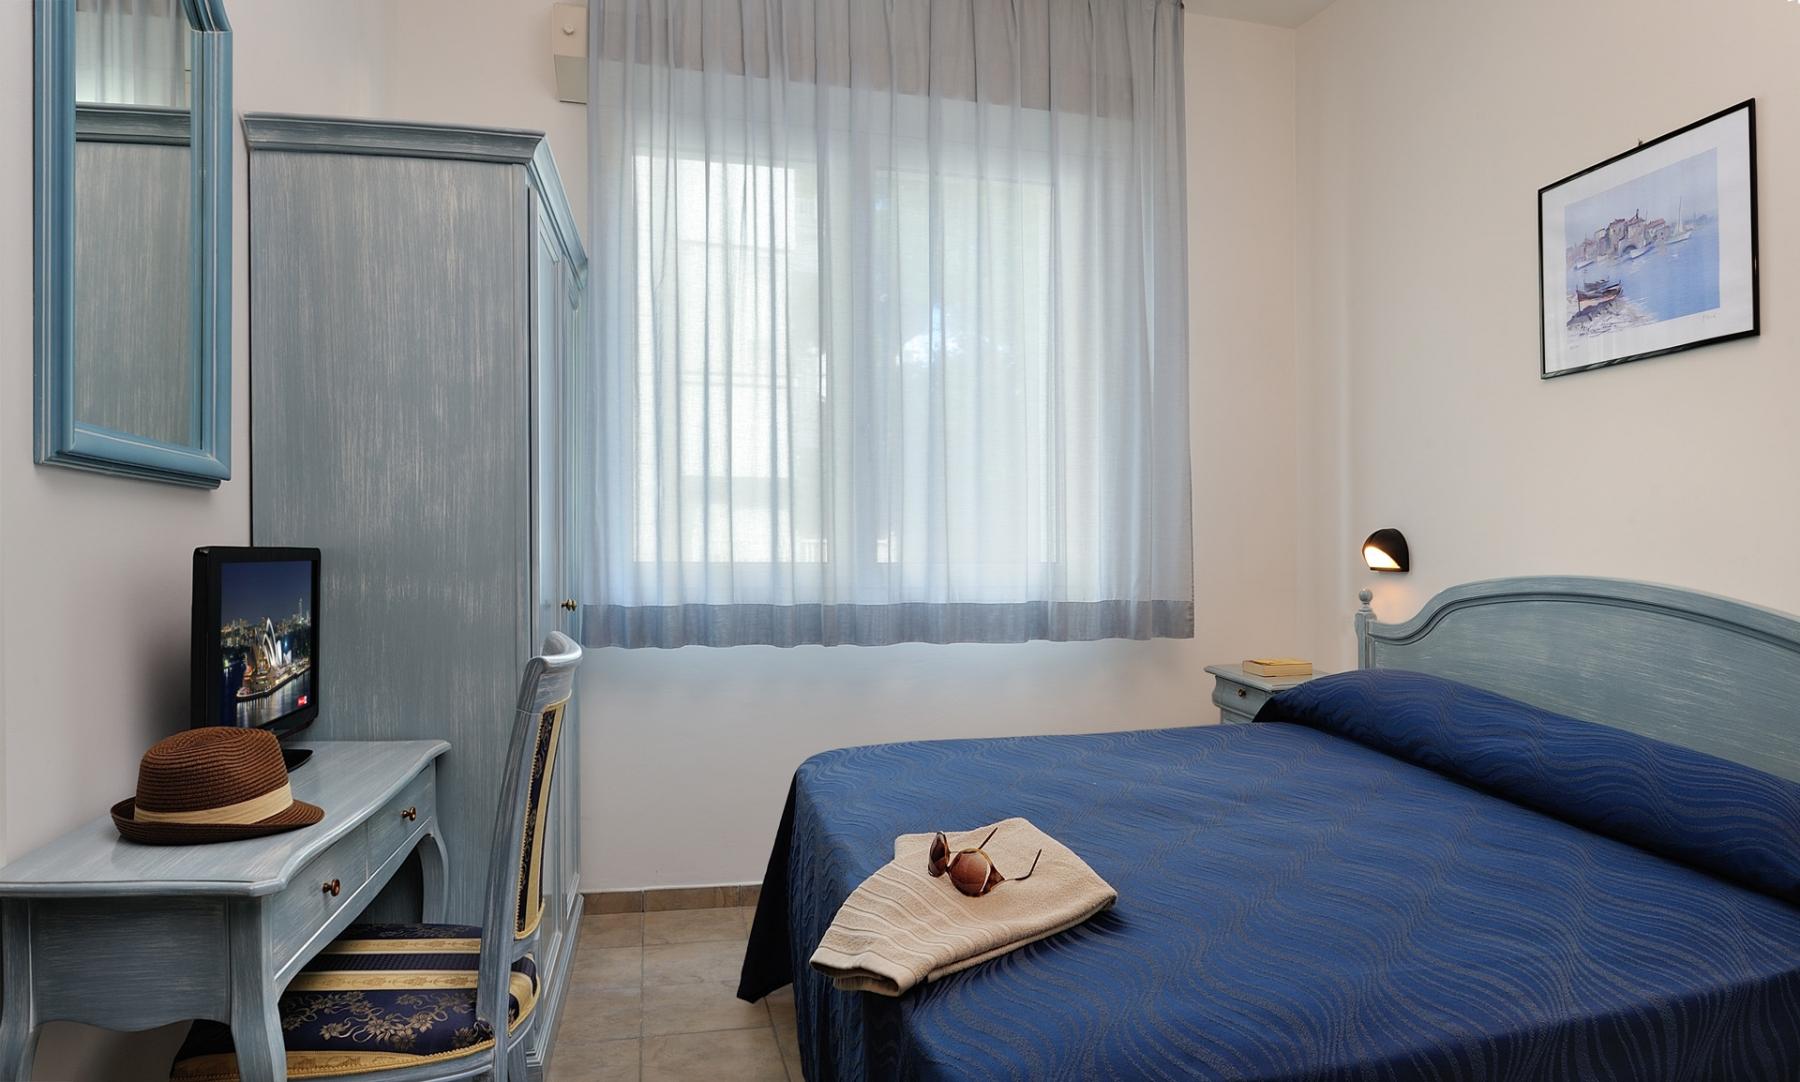 Camera Matrimoniale 14 Mq.Camera Comfort Hotel Marilenahotel Marilena